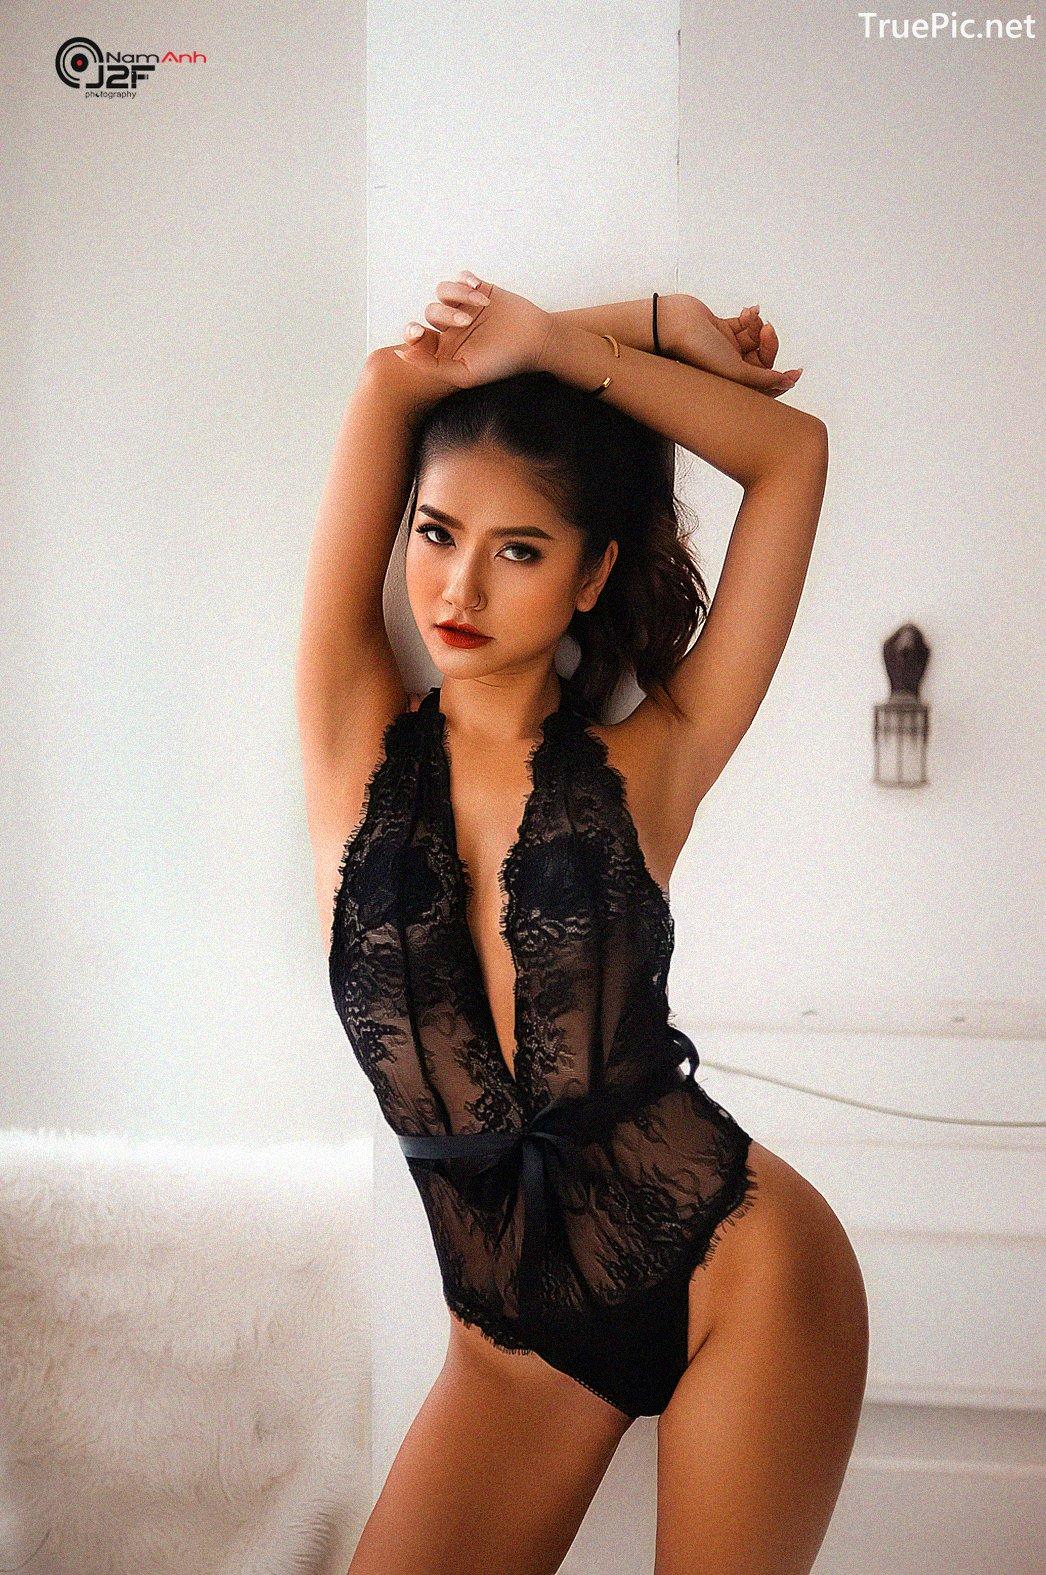 Image Vietnamese Model – Sexy Beauty of Beautiful Girls Taken by NamAnh Photo #7 - TruePic.net - Picture-32